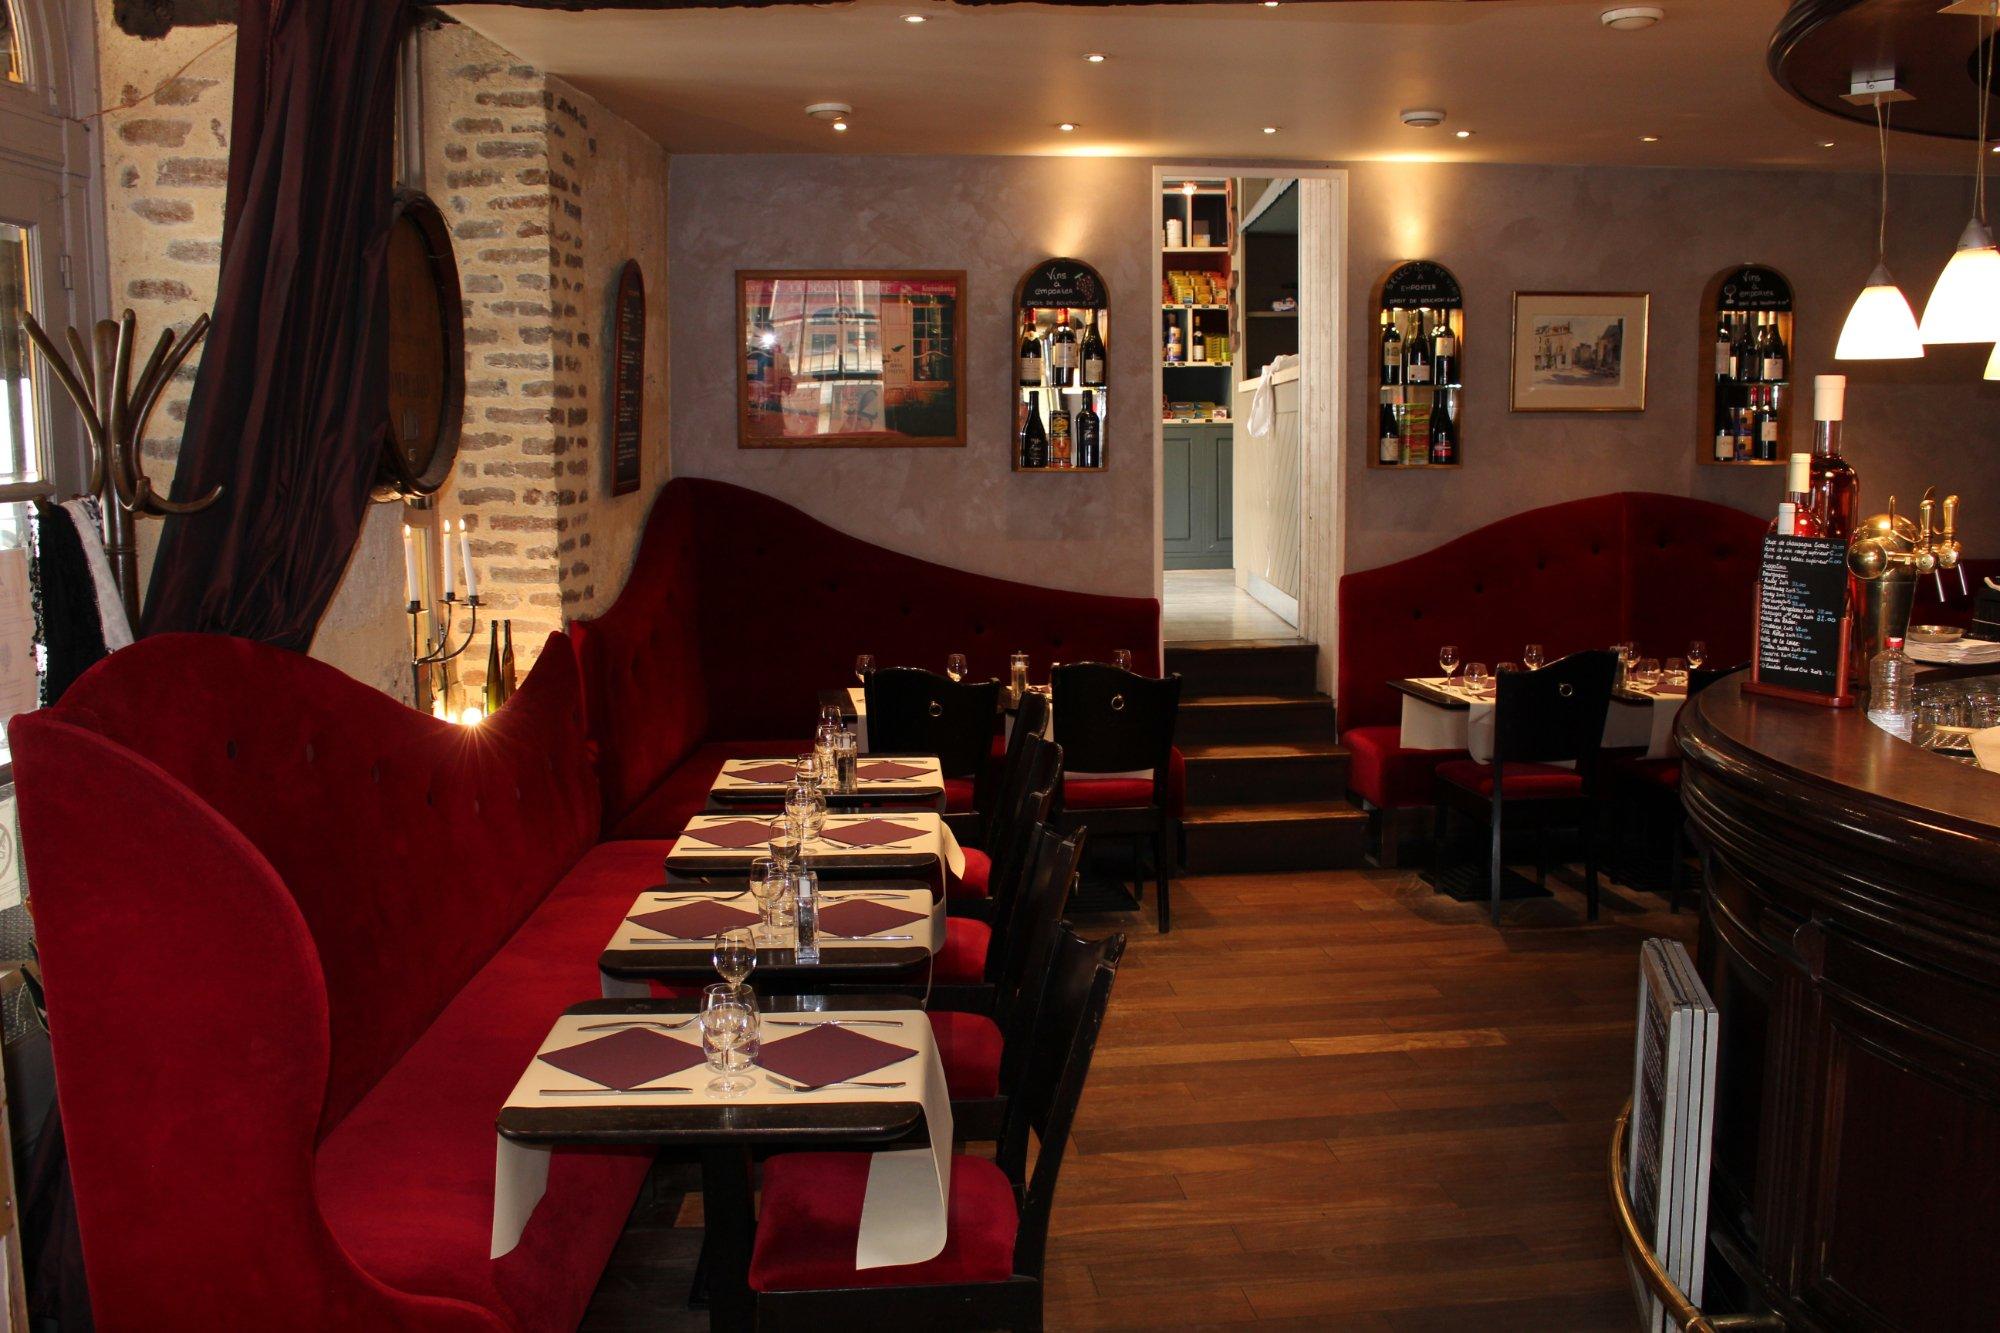 France Food Guide: 6 Wine Bar food Must-Eat Restaurants & Street Food Stalls in Osny